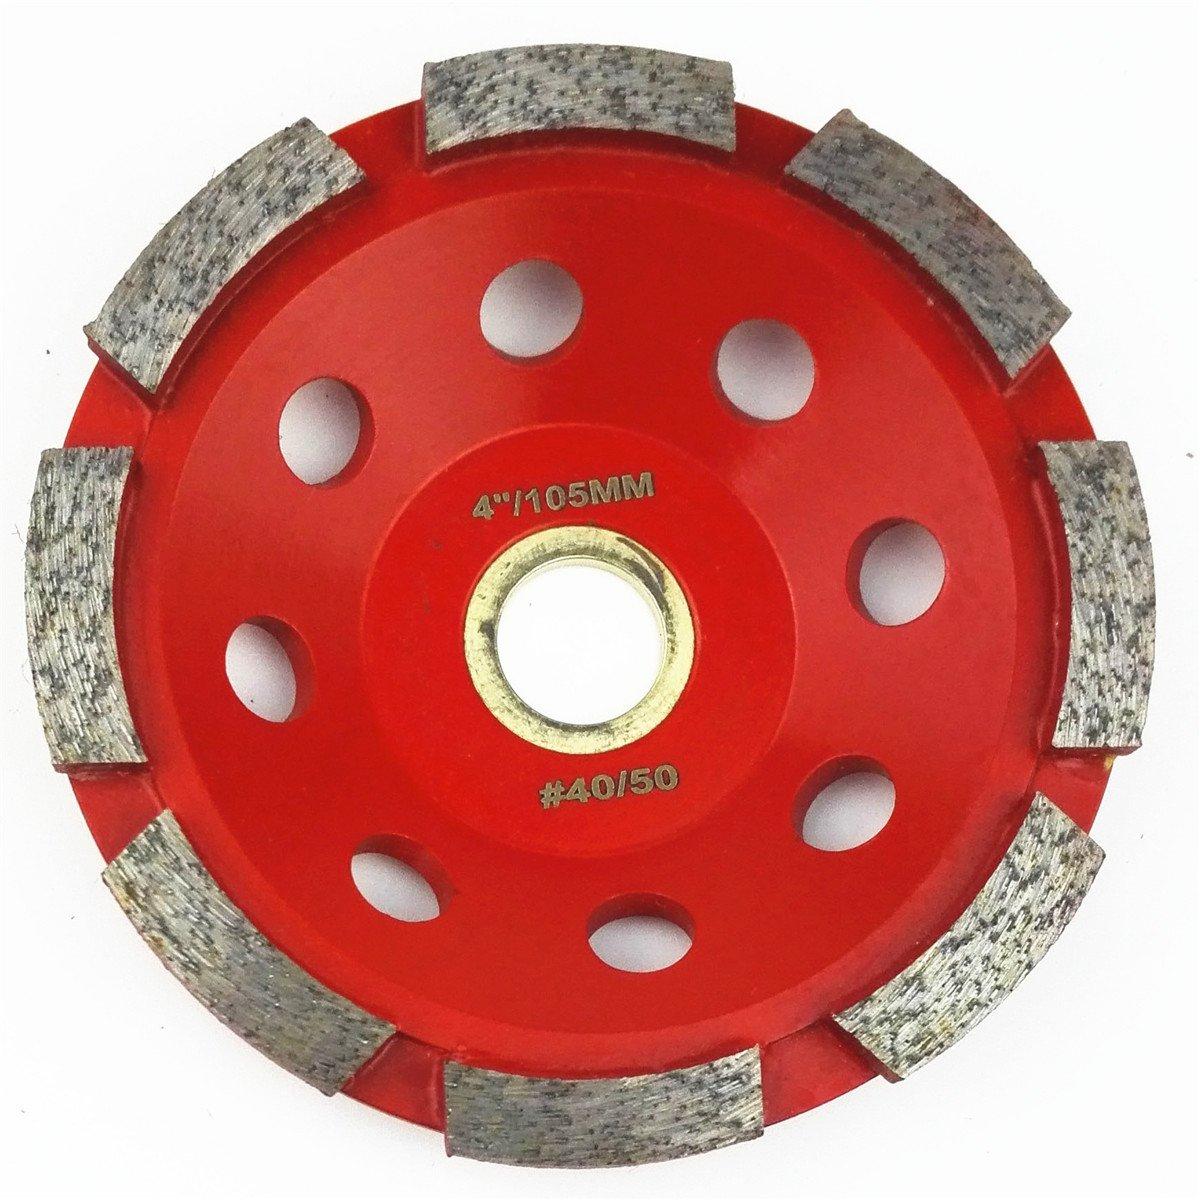 SHDIATOOL 4 Inch Single-Row Concrete Challenge the lowest price of Japan Wheel trend rank Diamond Gran Grinding